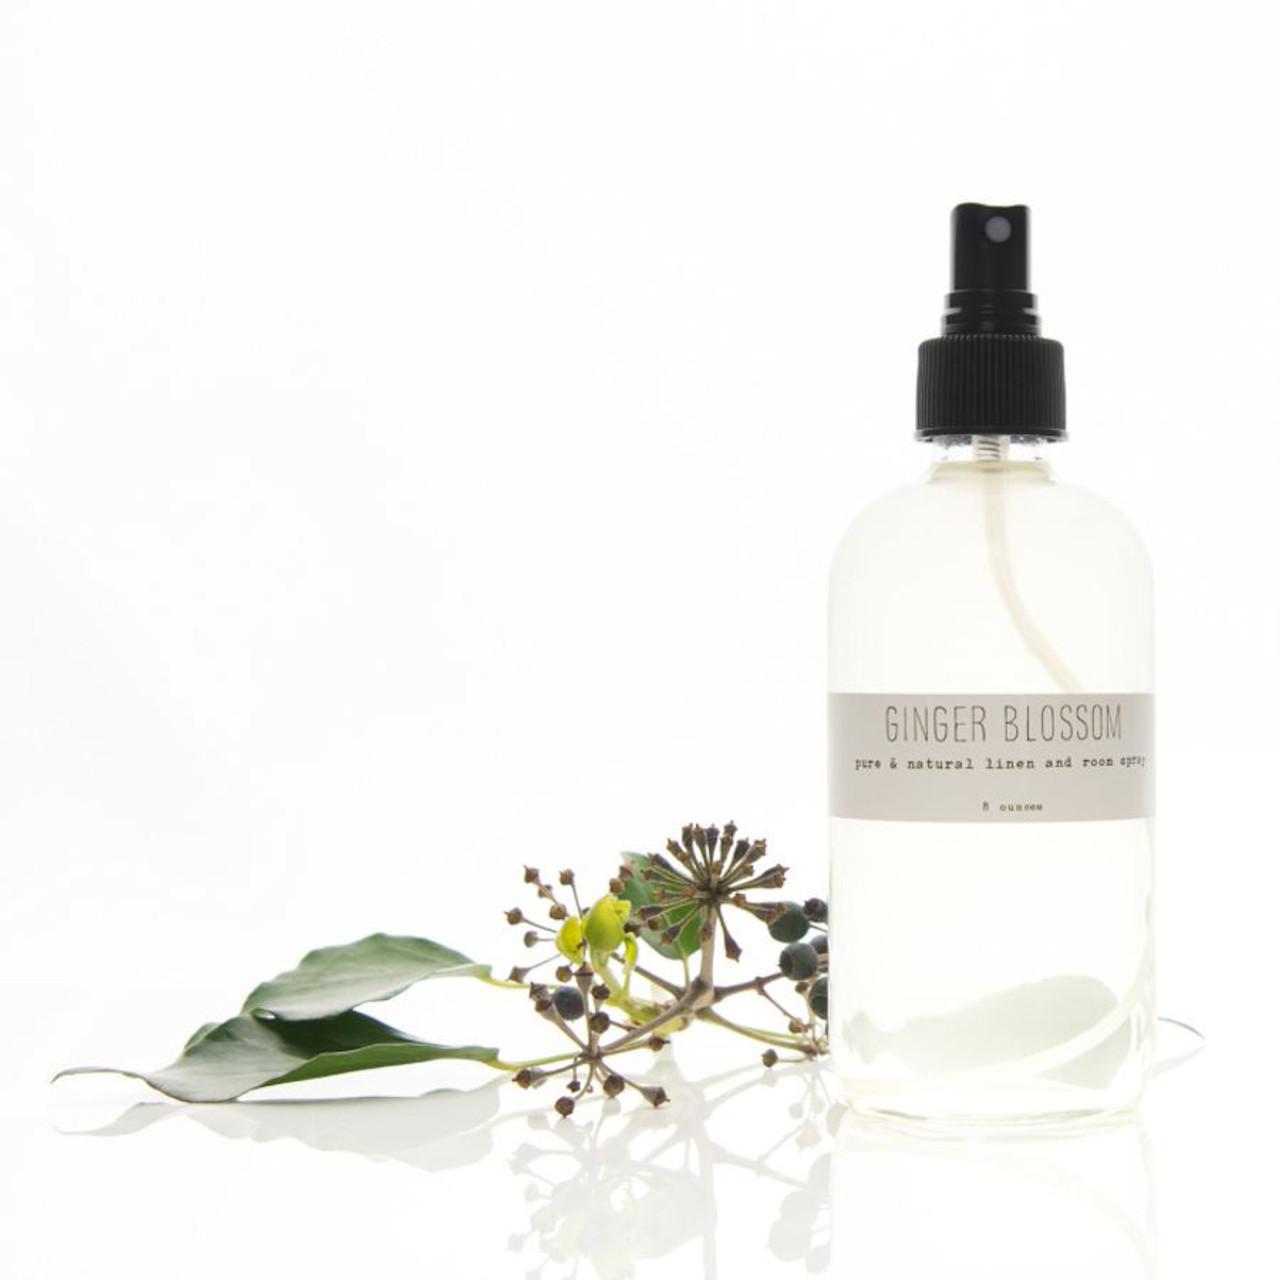 Ginger Blossom Room Spray